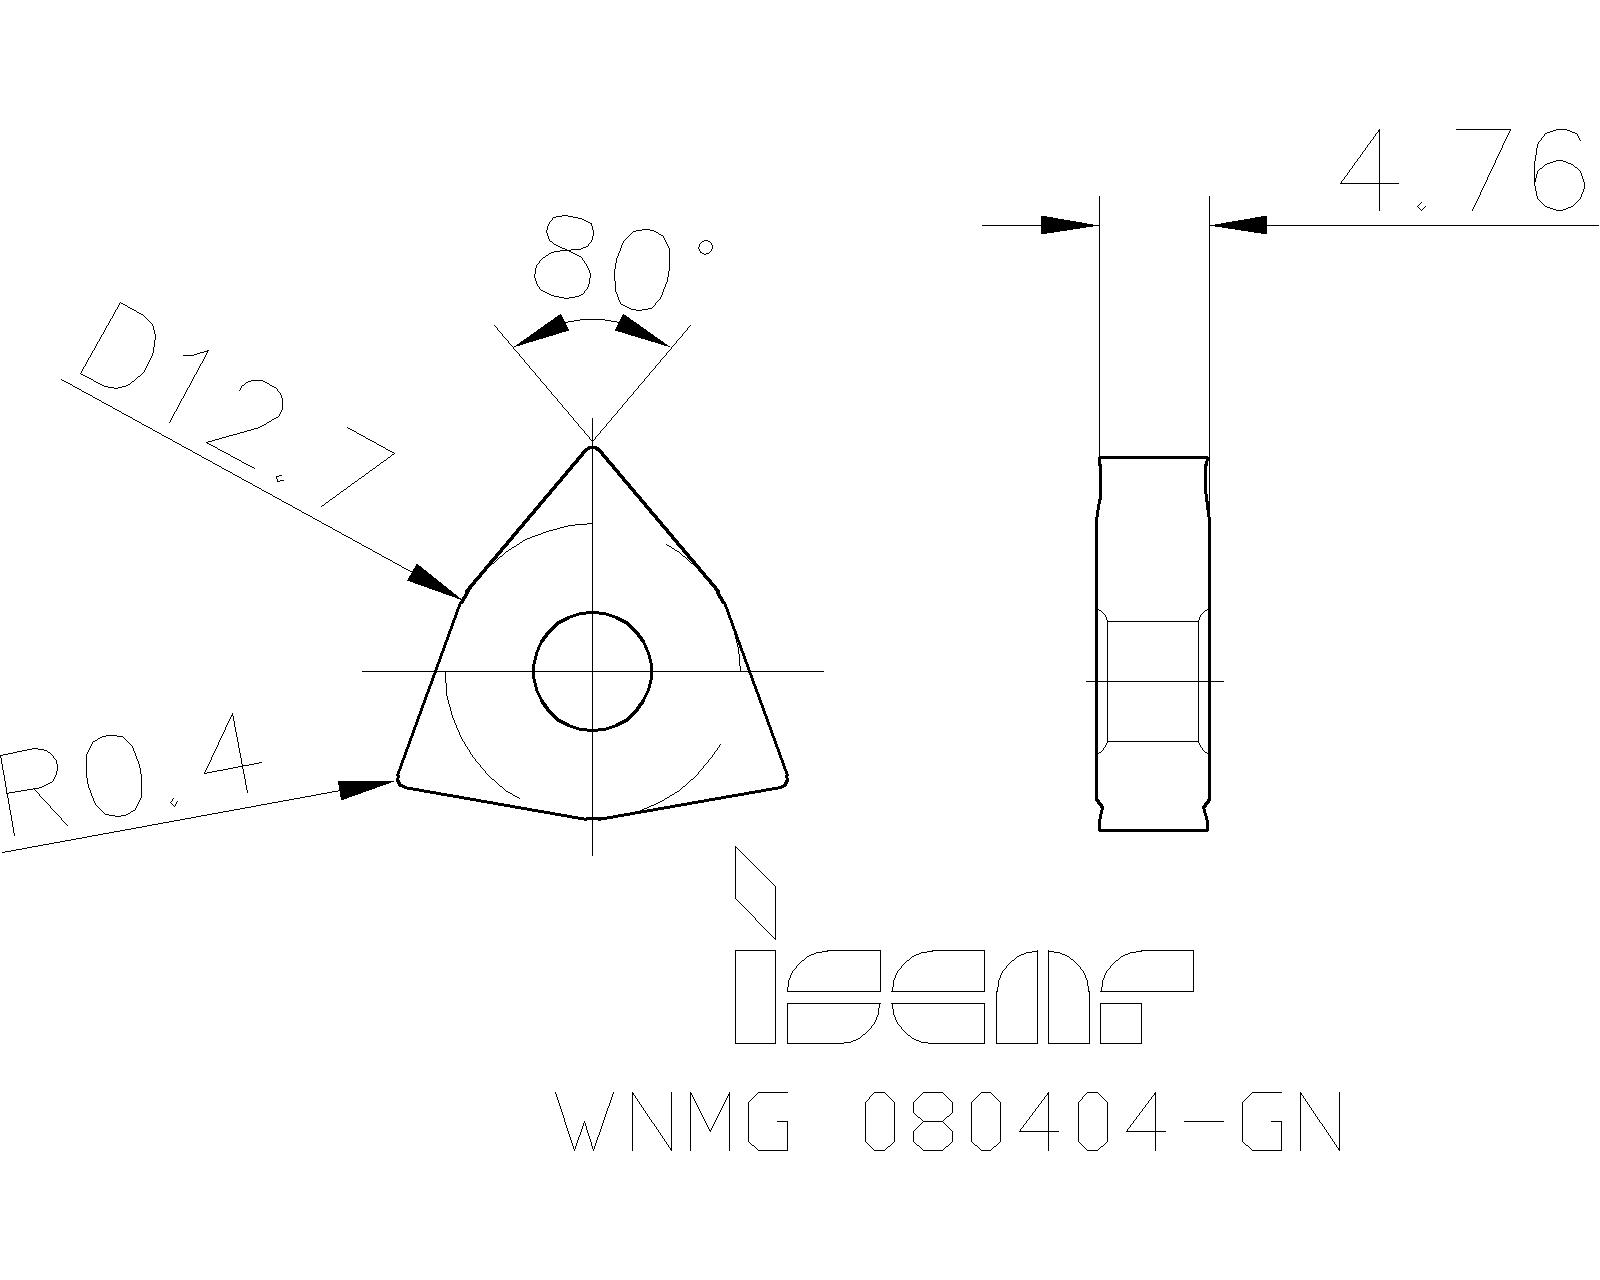 WNMG431 MS WNMG 080404 R0.4 Lathe Carbide insert Universal material For MWLNR